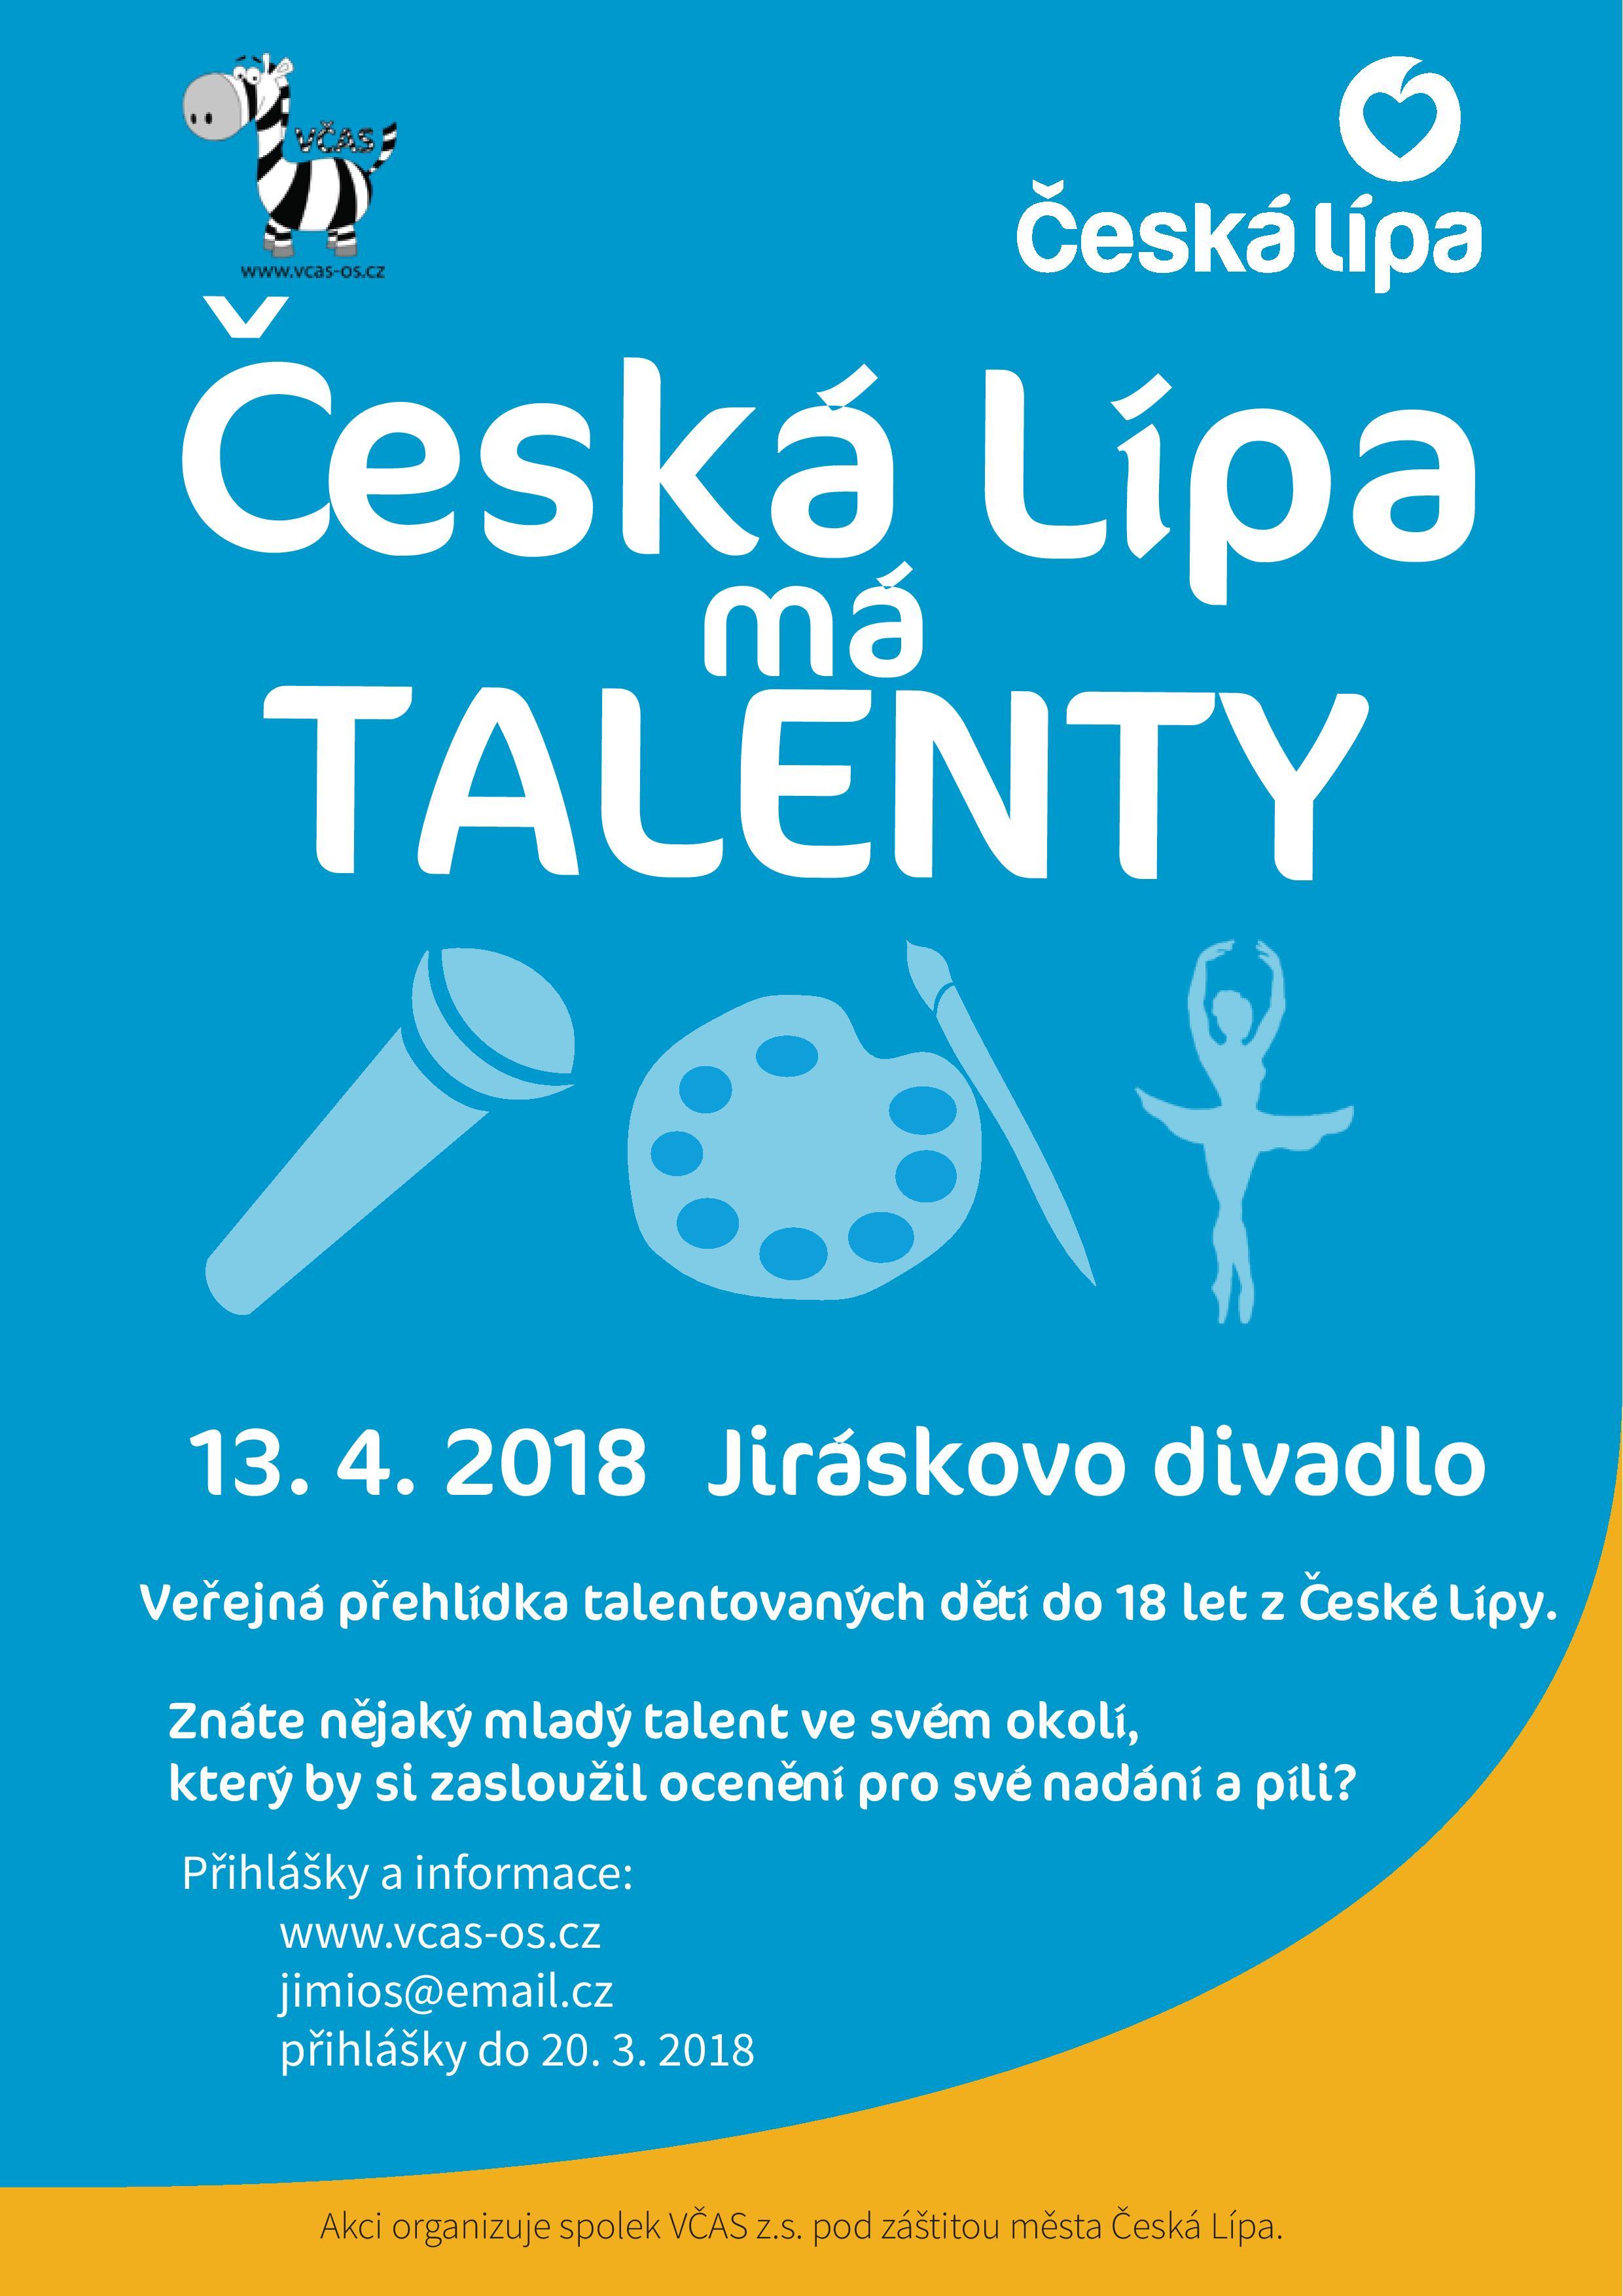 CeskaLipamatalent_FINAL-page-001